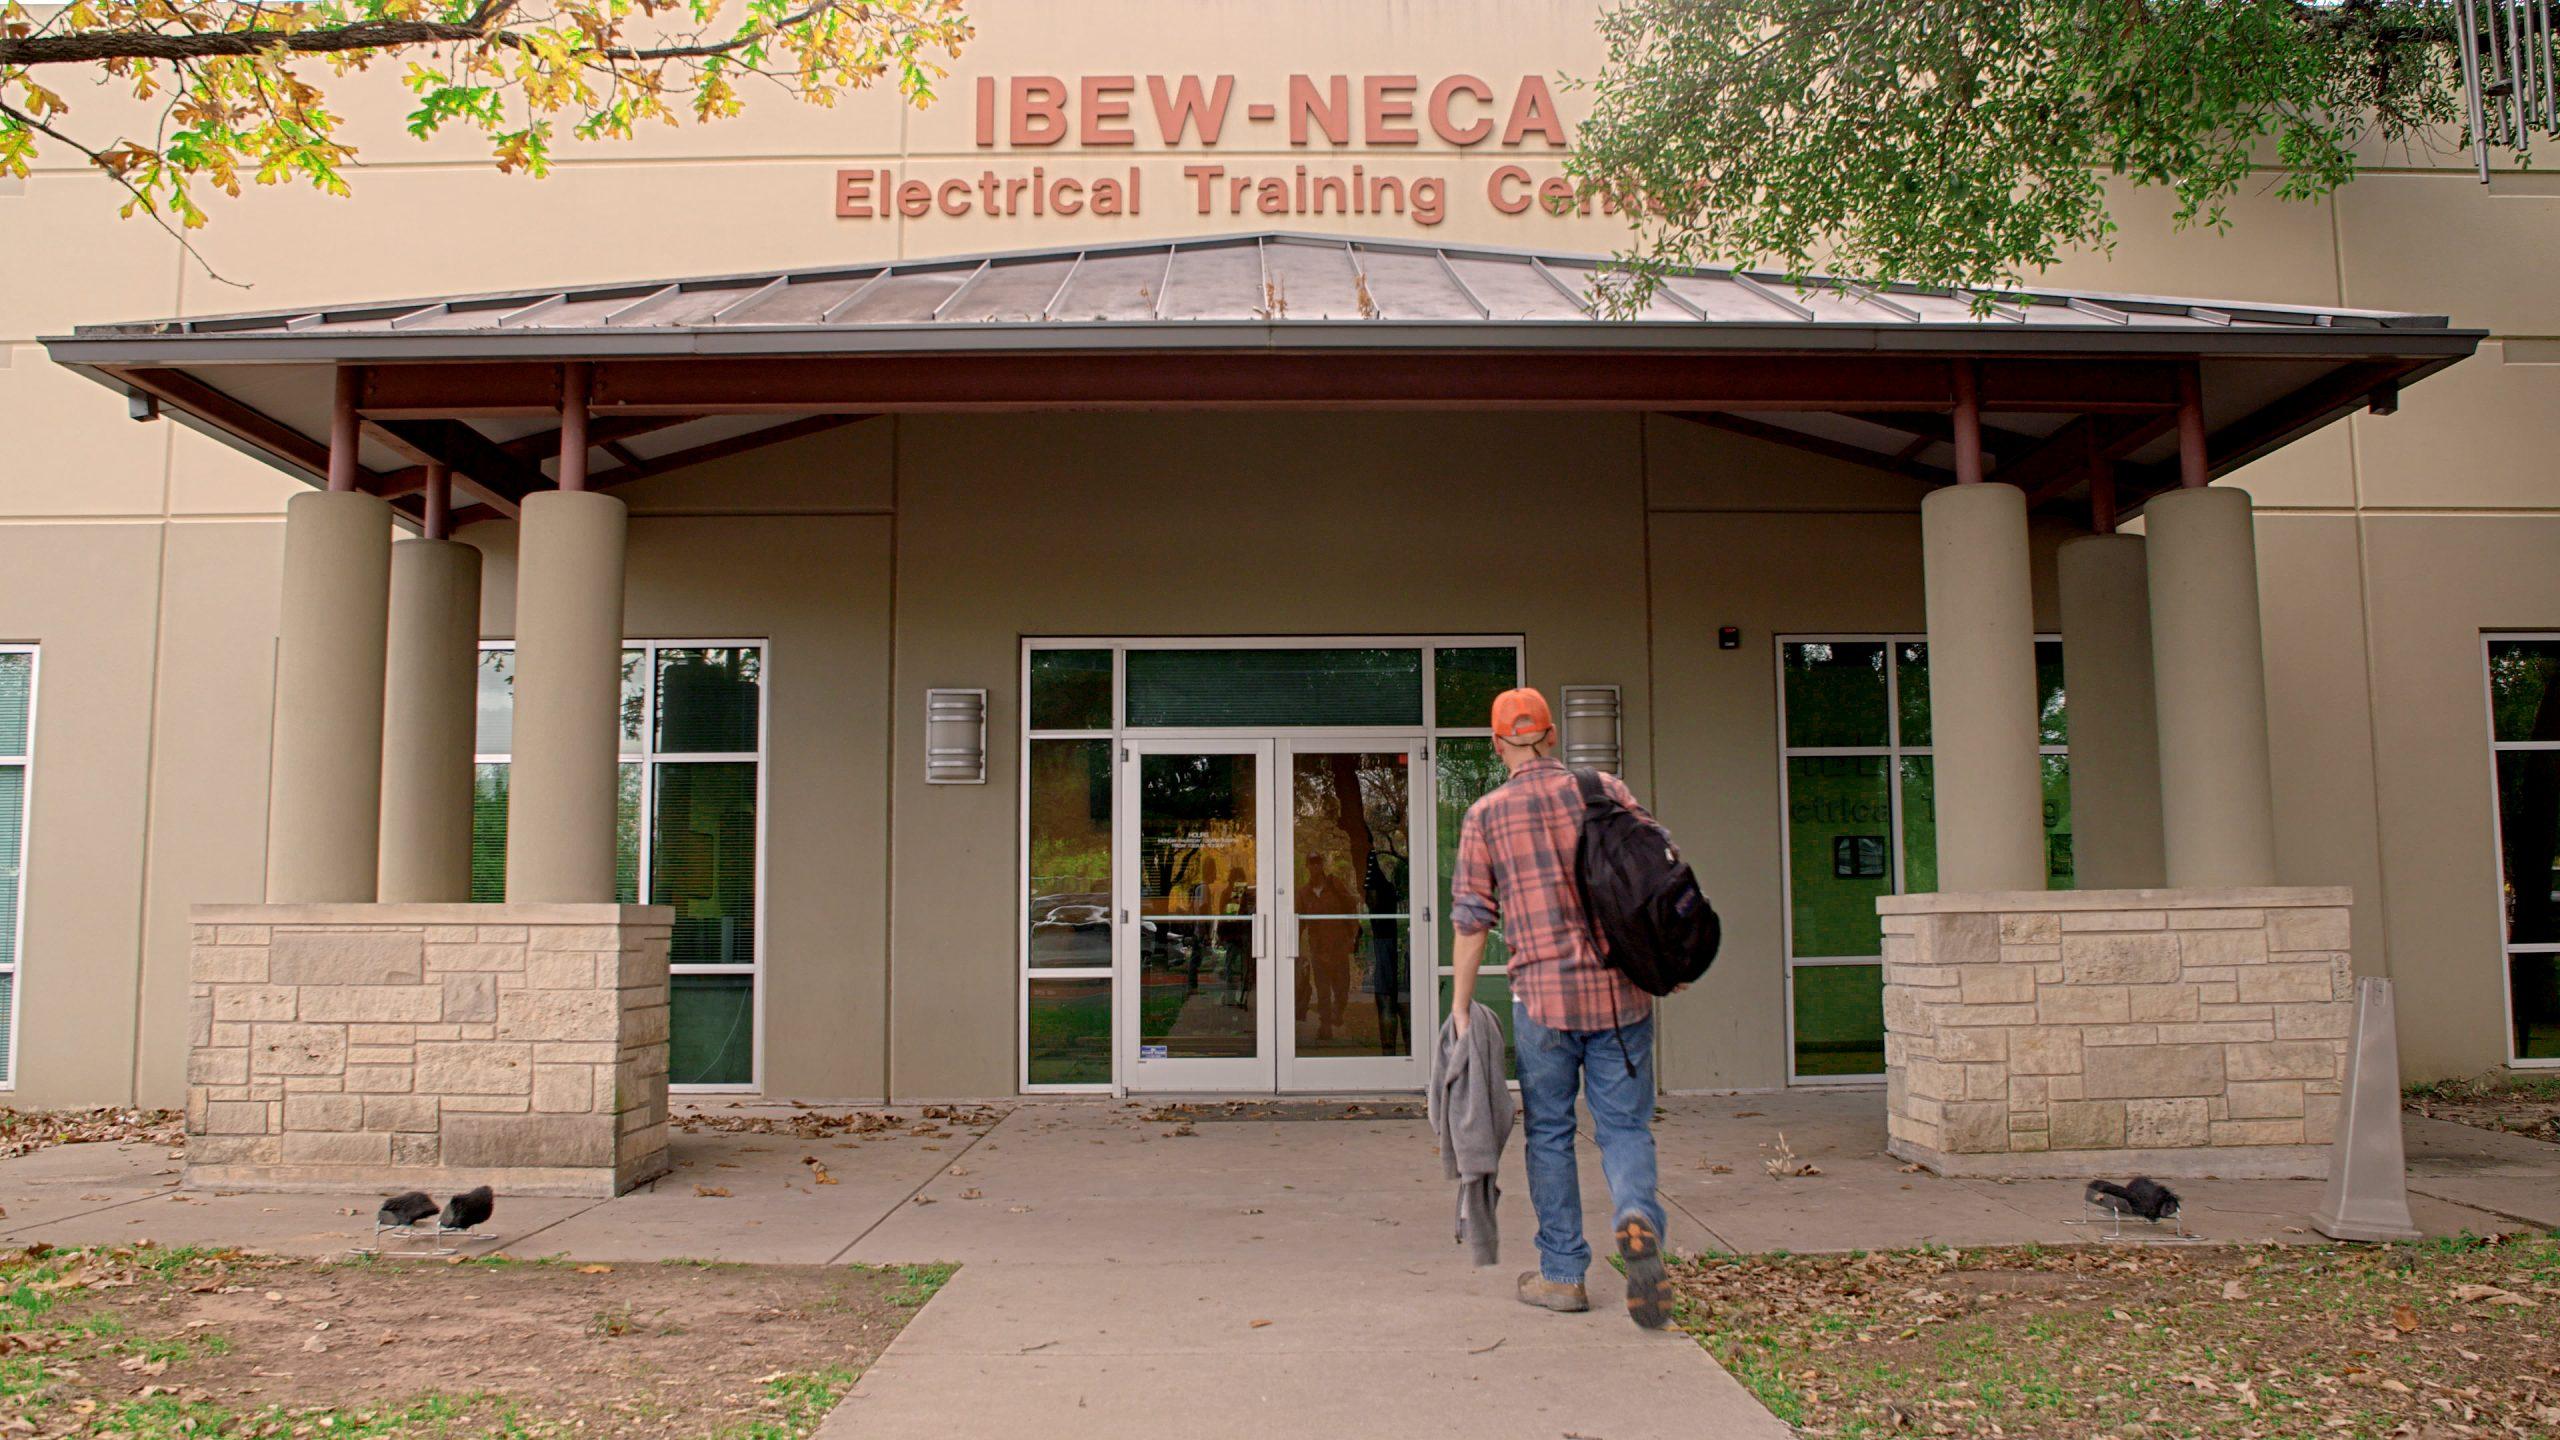 IBEW Local 520 - NECA Electrical Training Center